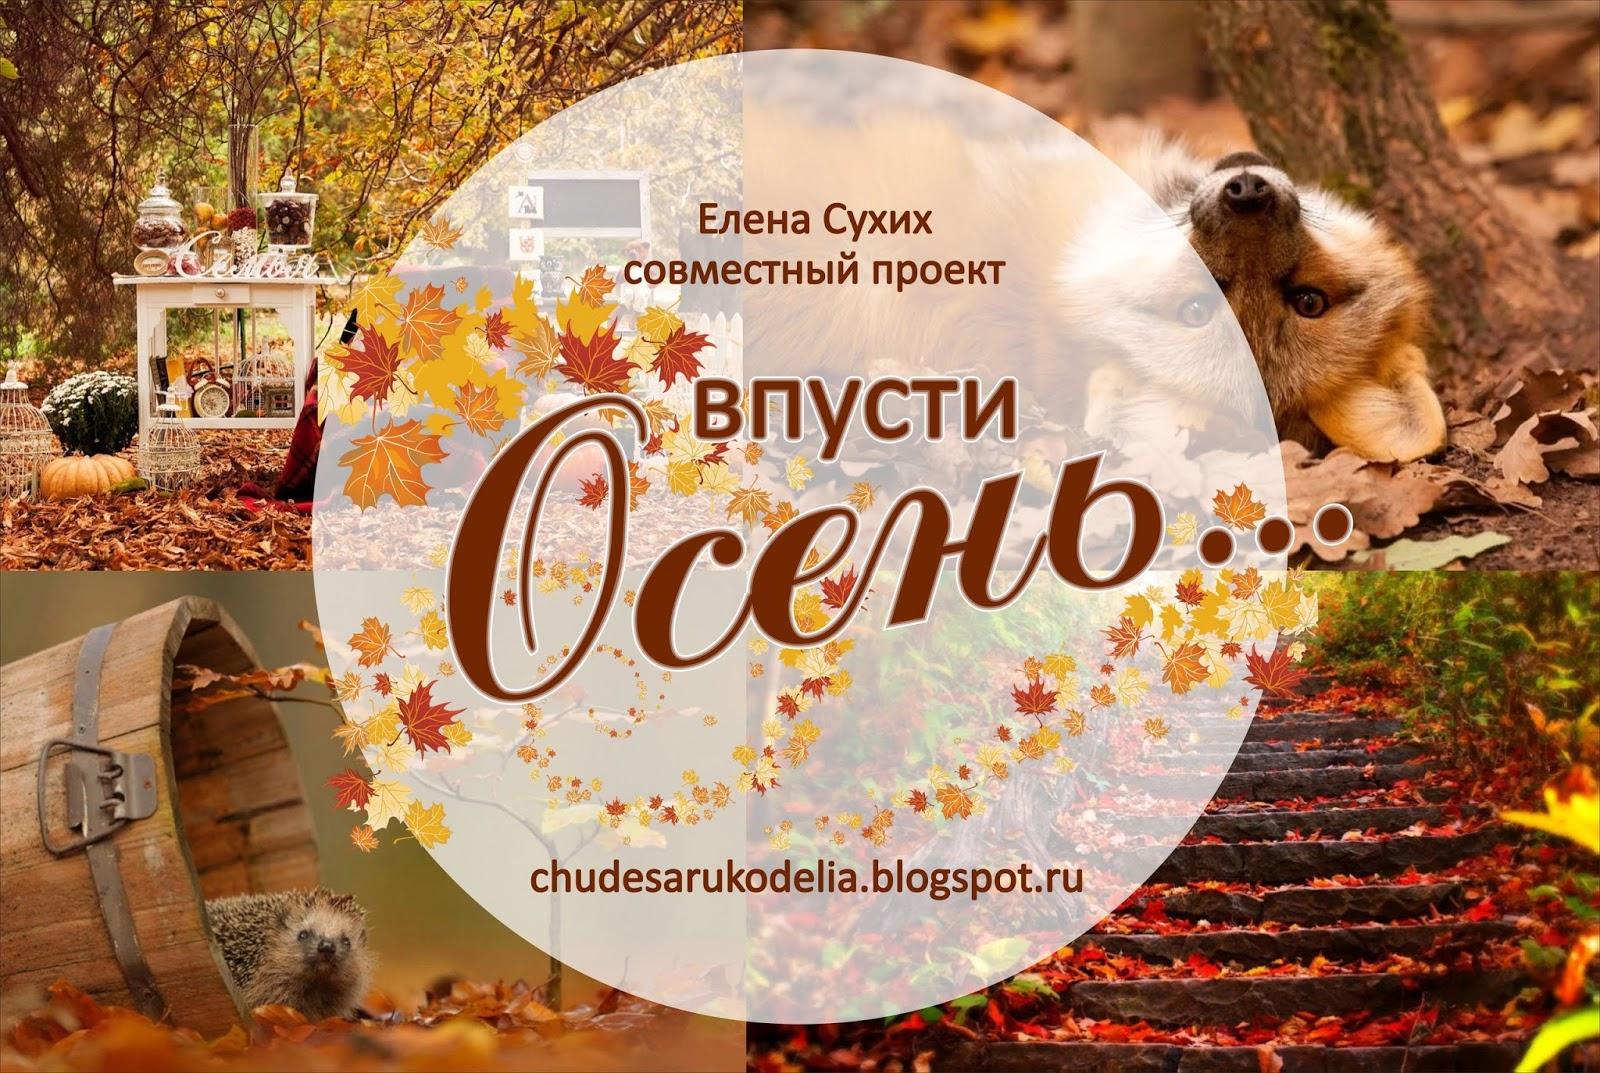 СП Впусти осень у Лены Сухих